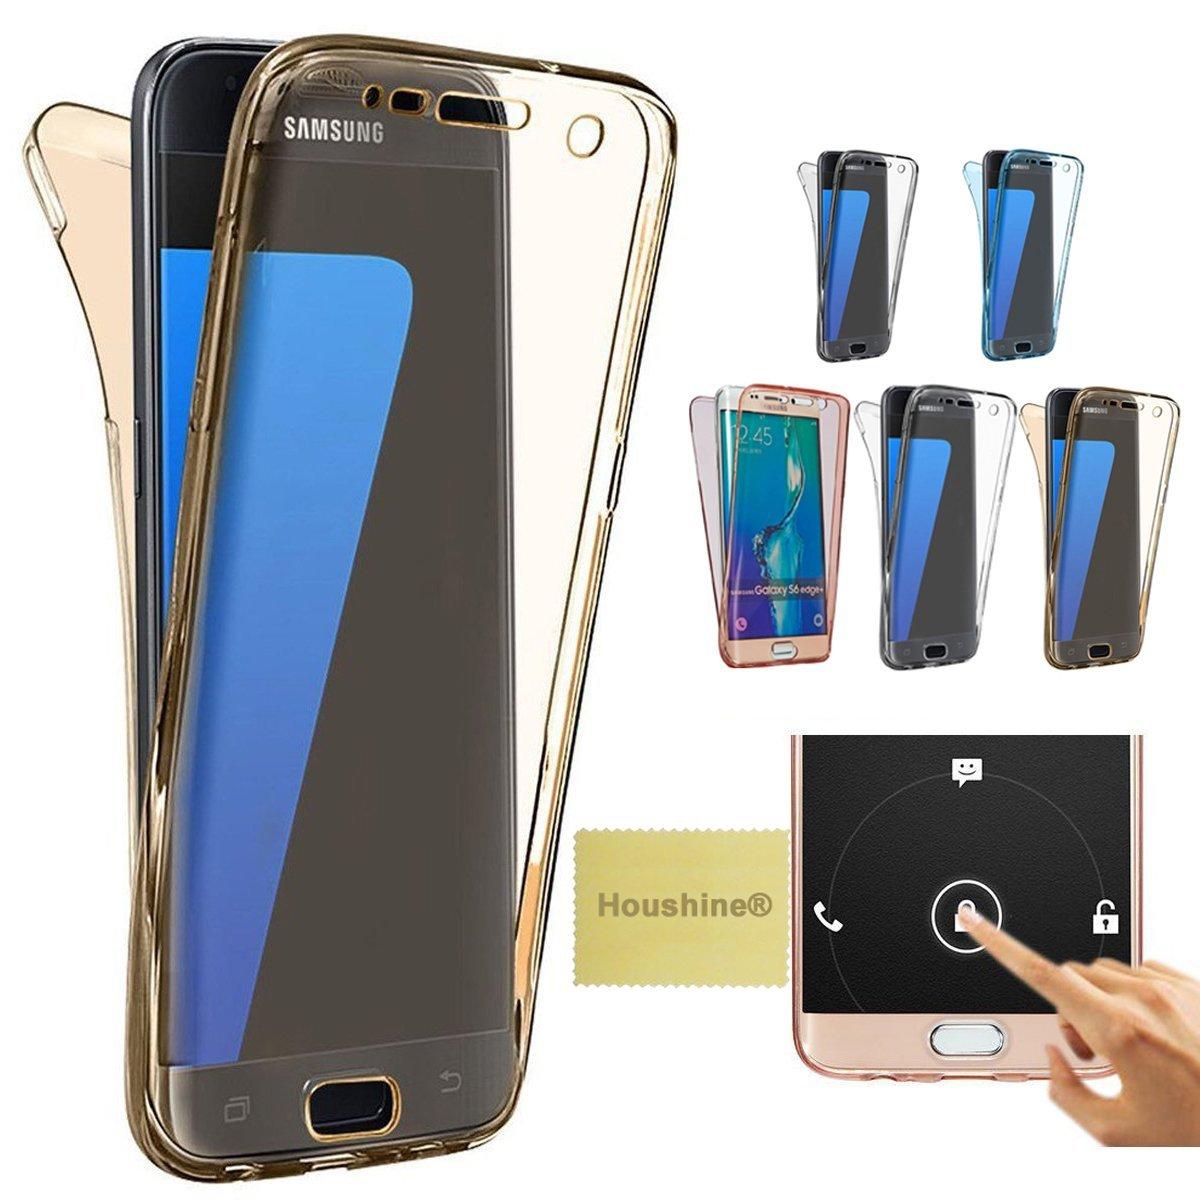 premium selection 1e043 5c71f Amazon.com: J5 2015 case(Front+Back Cover Gel Series), Houshine ...